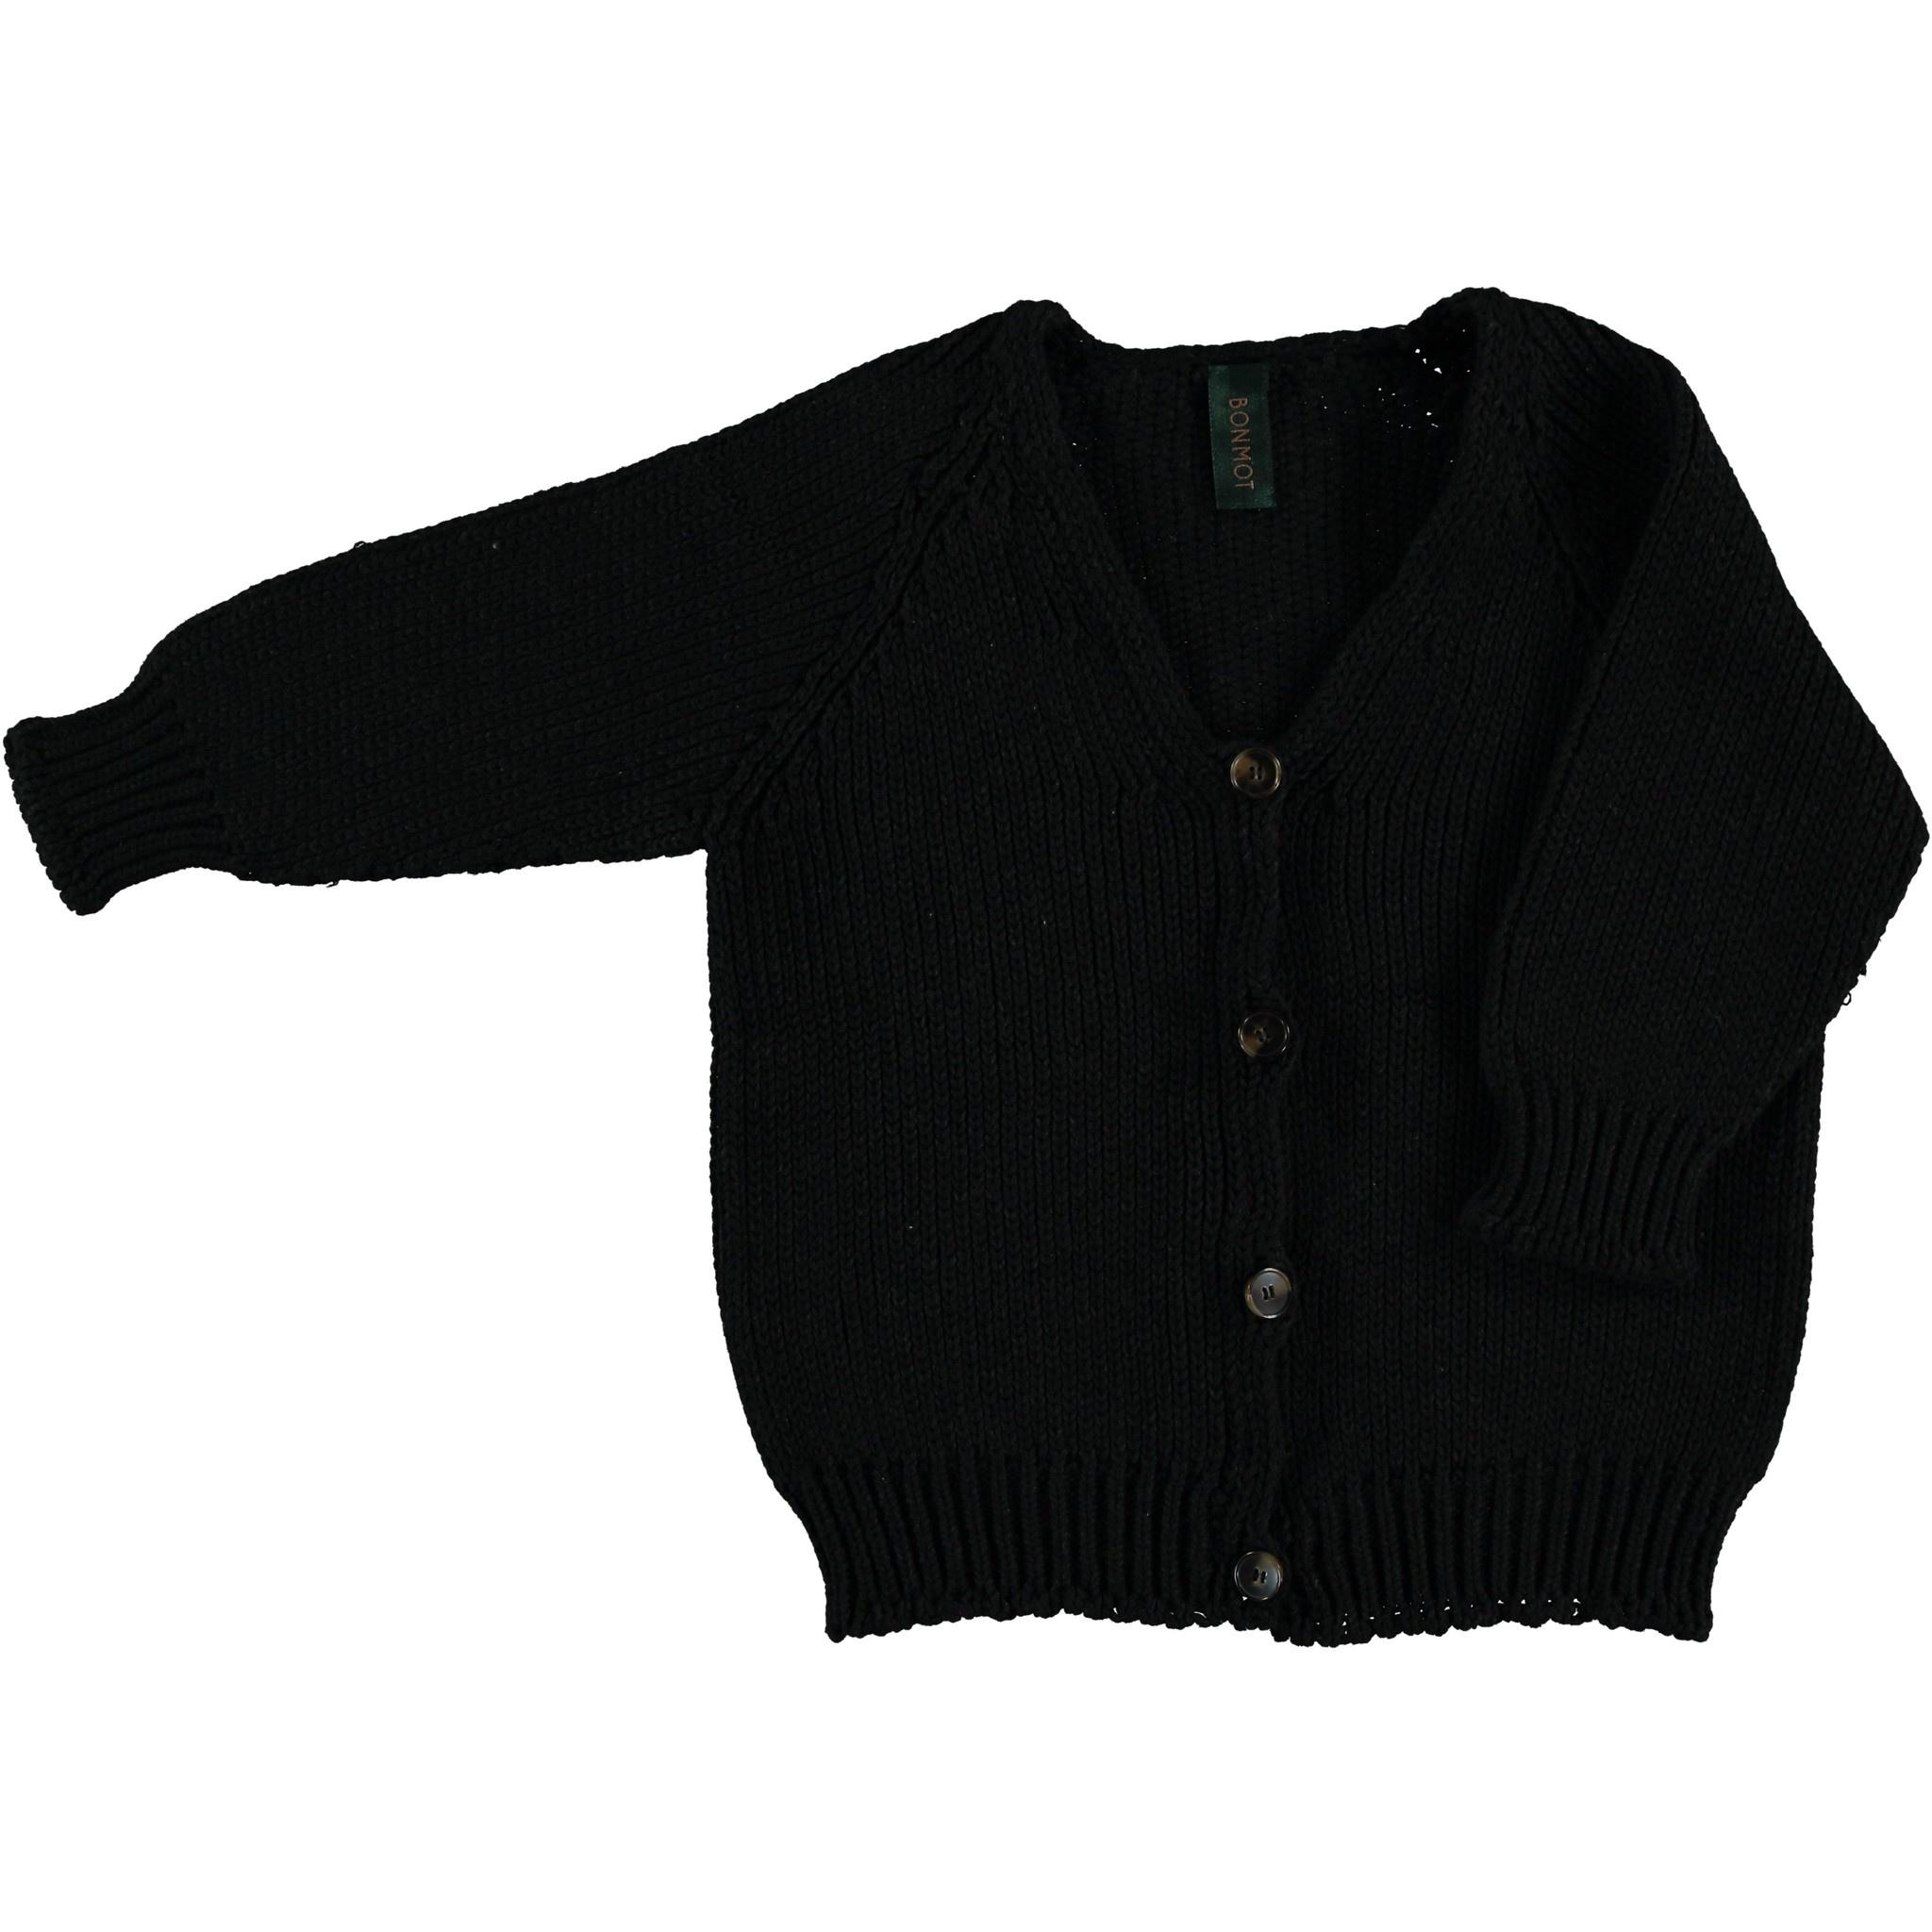 Cardigan v-neck plain - Dark Grey melange-1